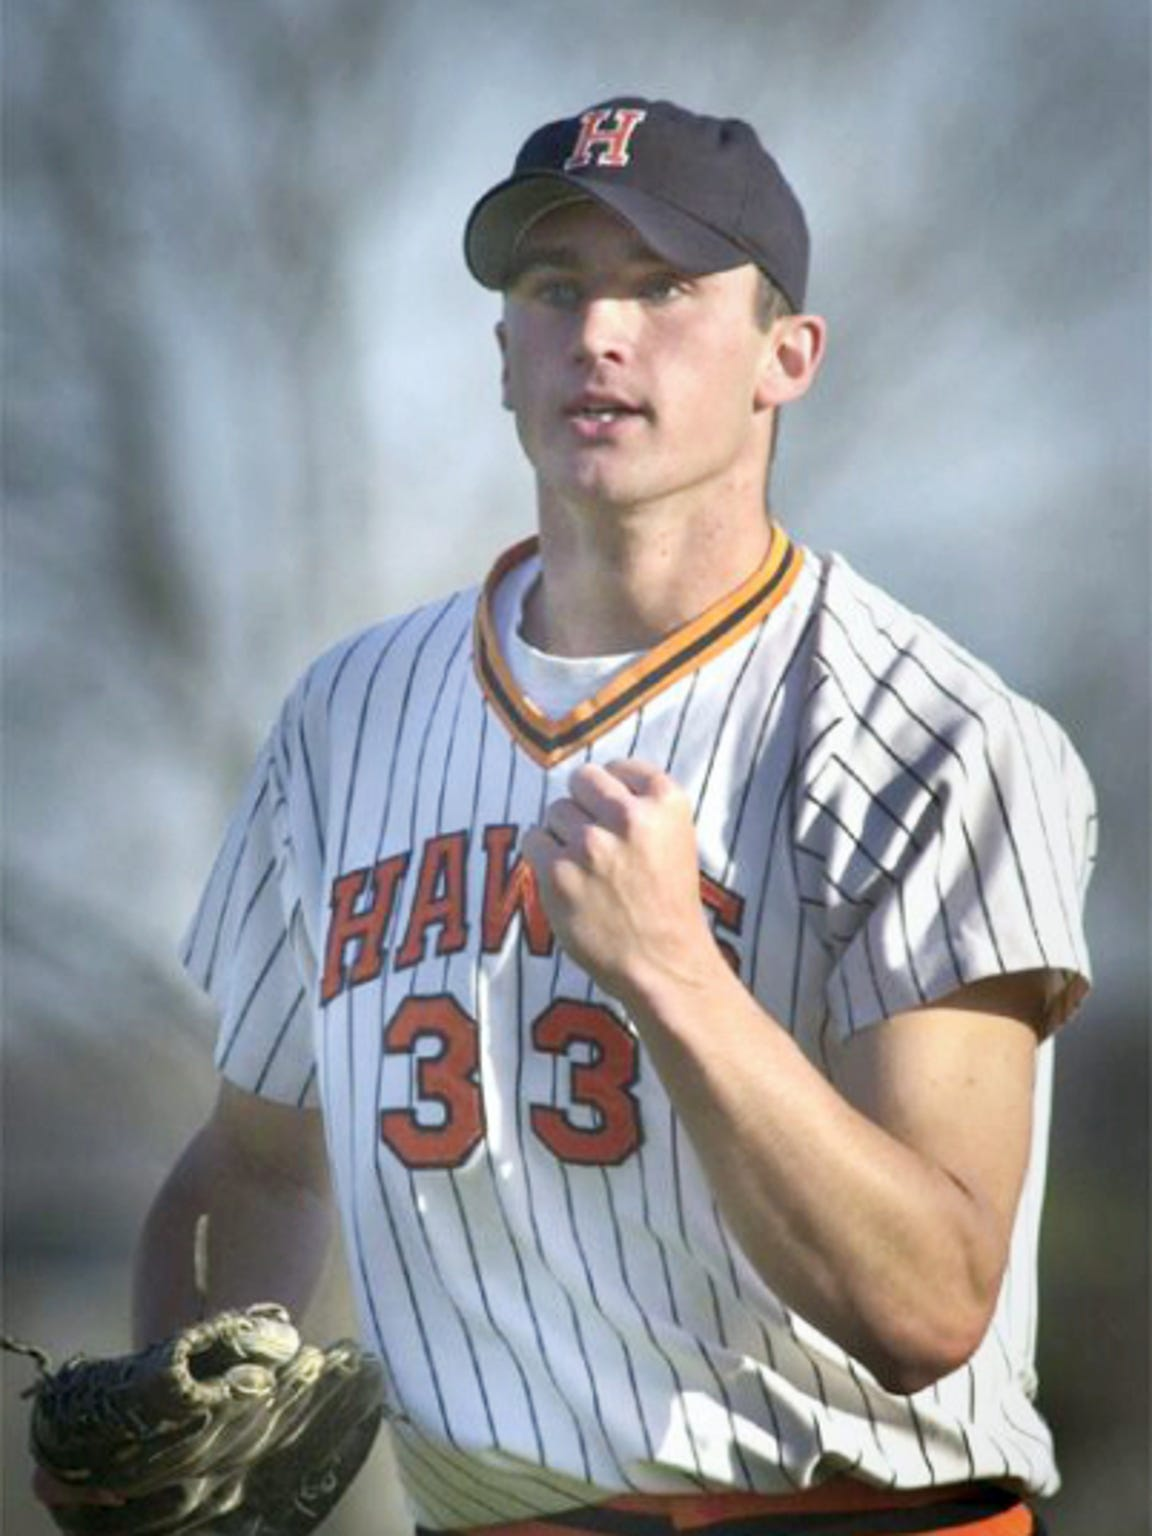 Mark Phillips celebrates a Hanover High School win